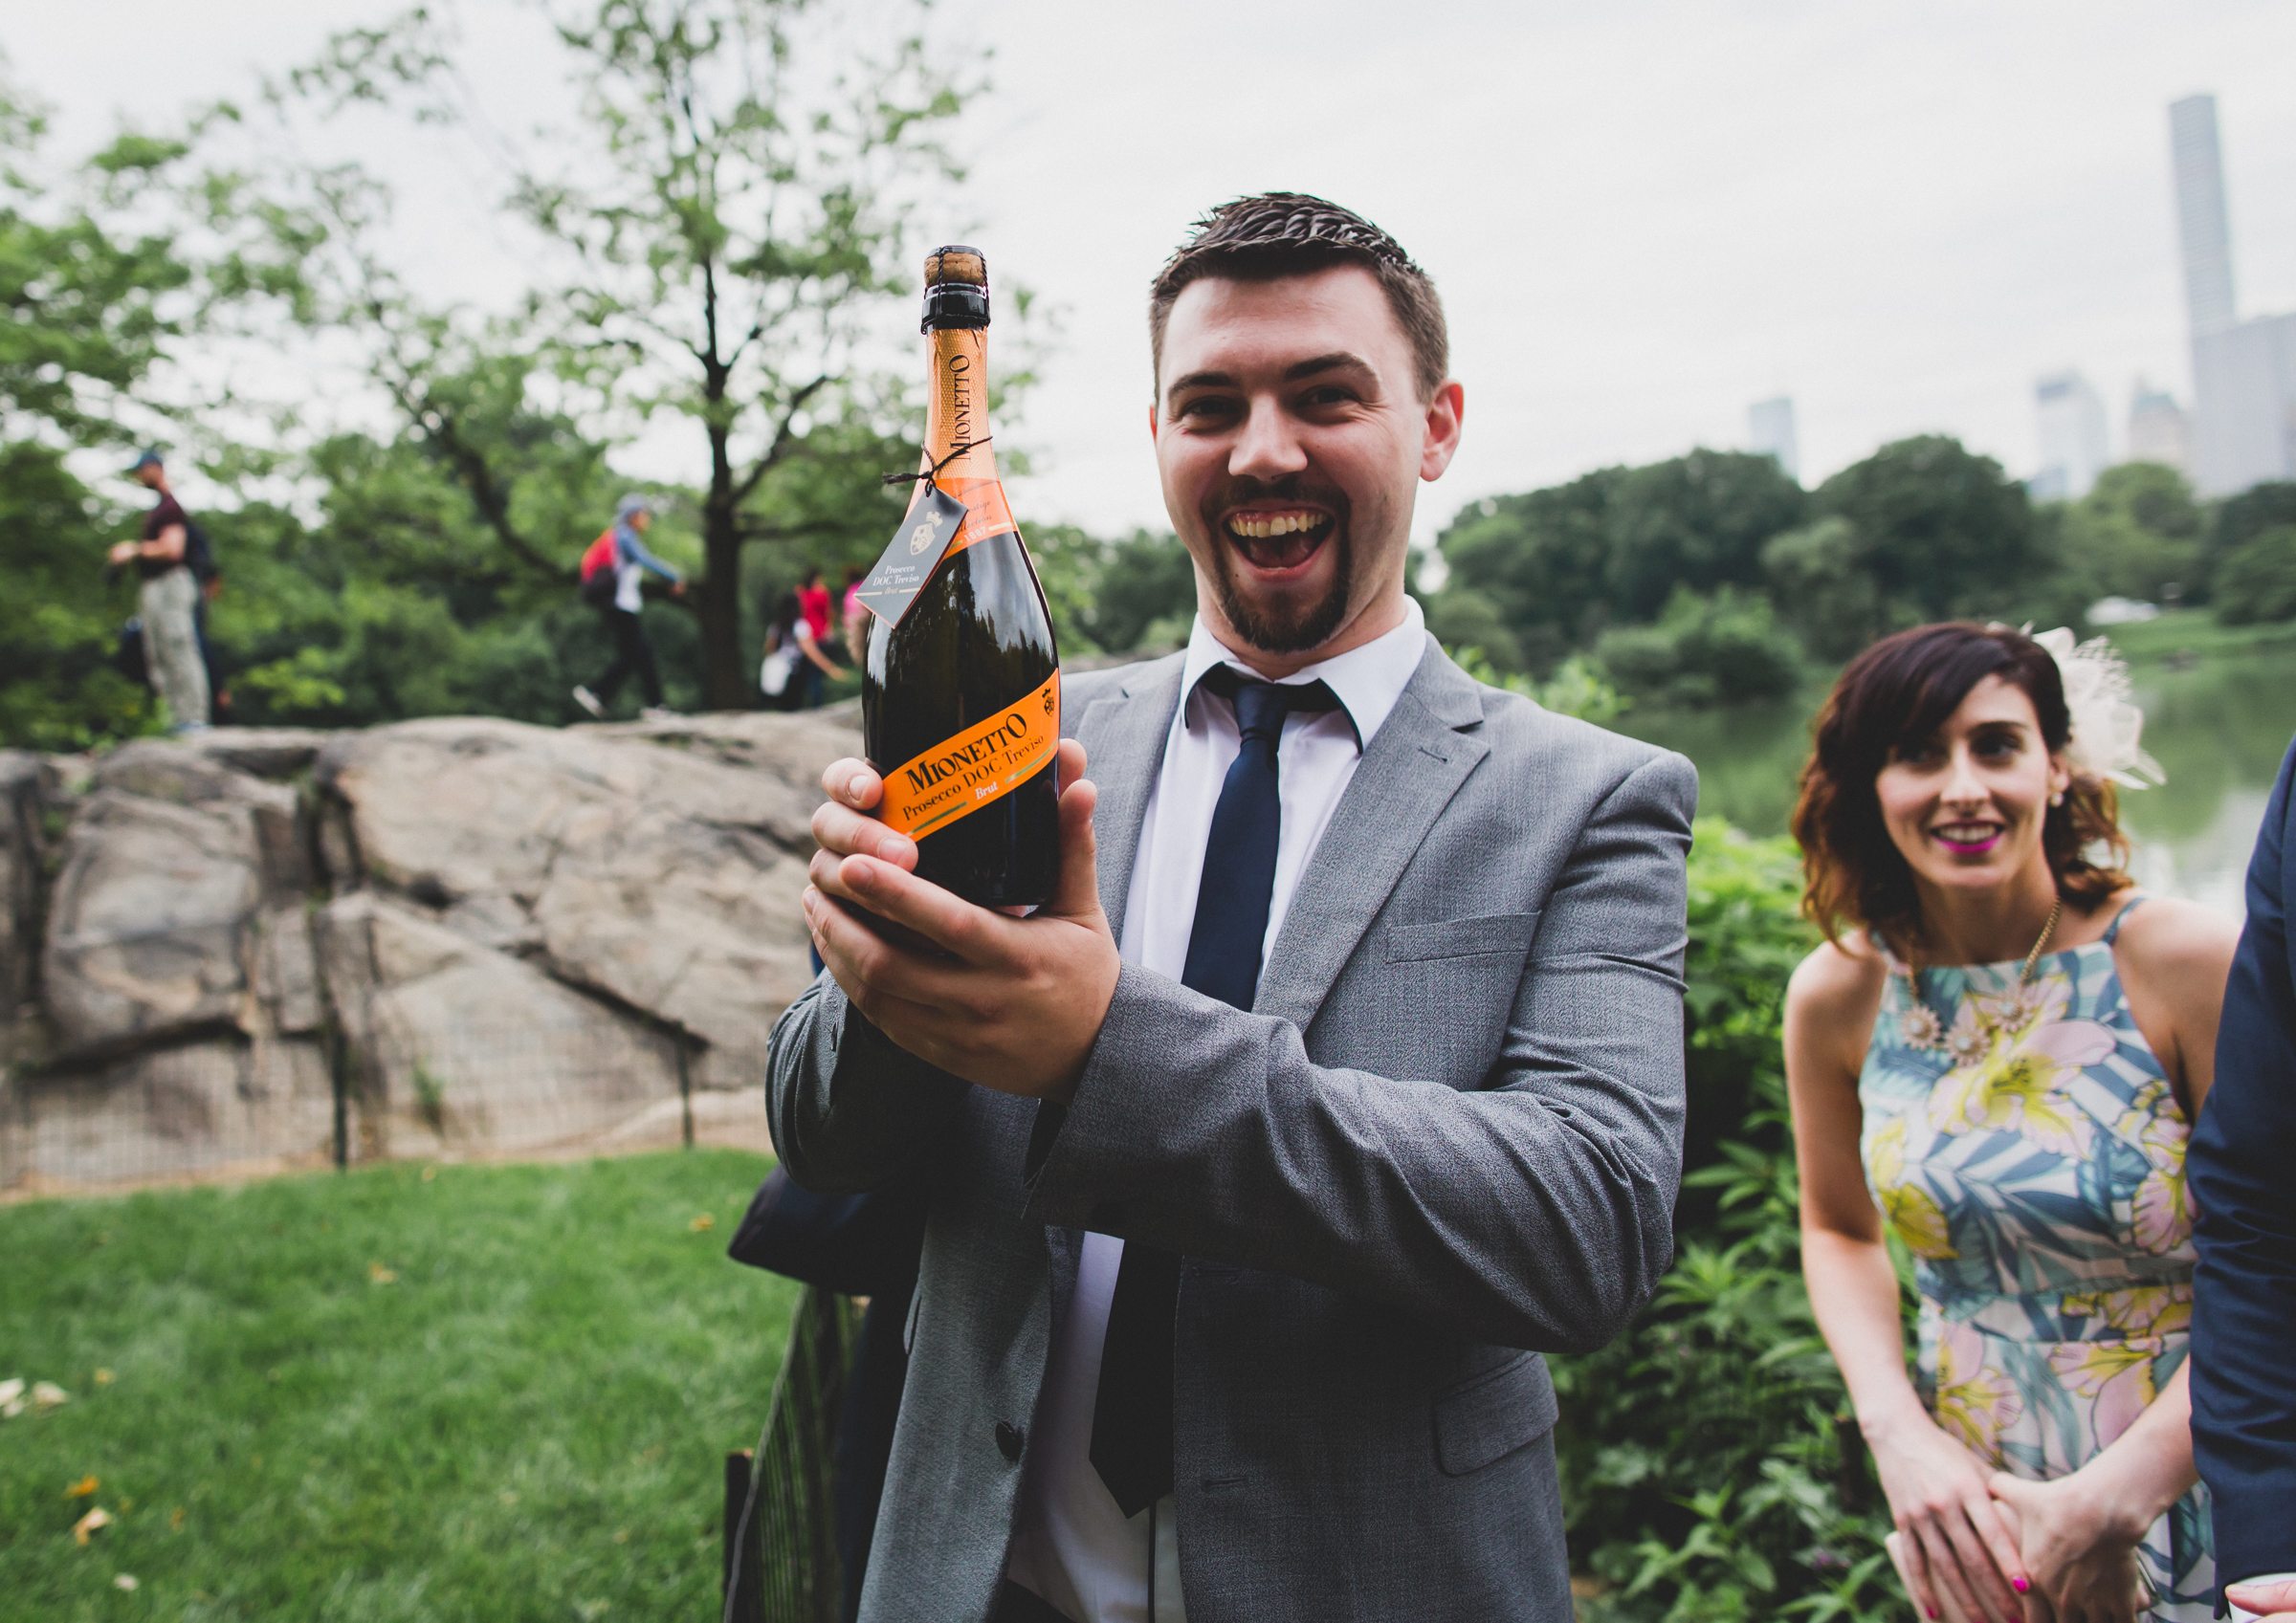 NYC-Central-Park-Elopement-New-York-Documentary-Wedding-Photographer-Dumbo-Brooklyn-Bridge-Park--26.jpg